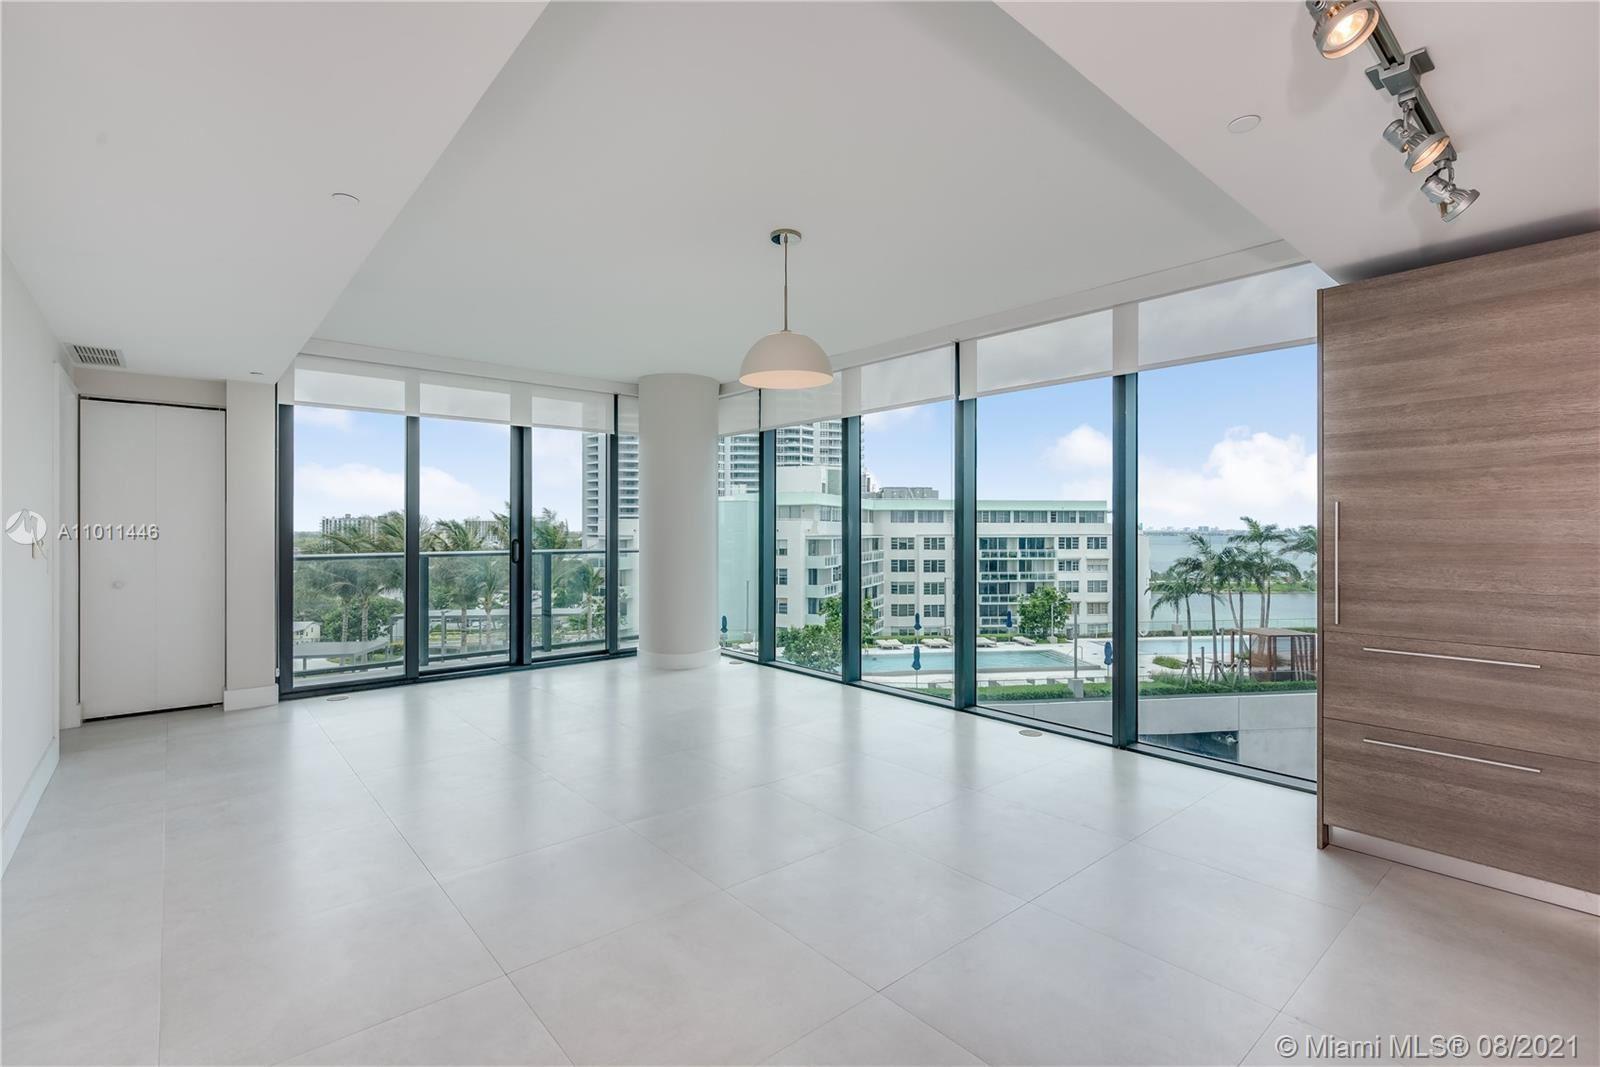 Photo of 650 NE 32nd St #1108, Miami, FL 33137 (MLS # A11011446)